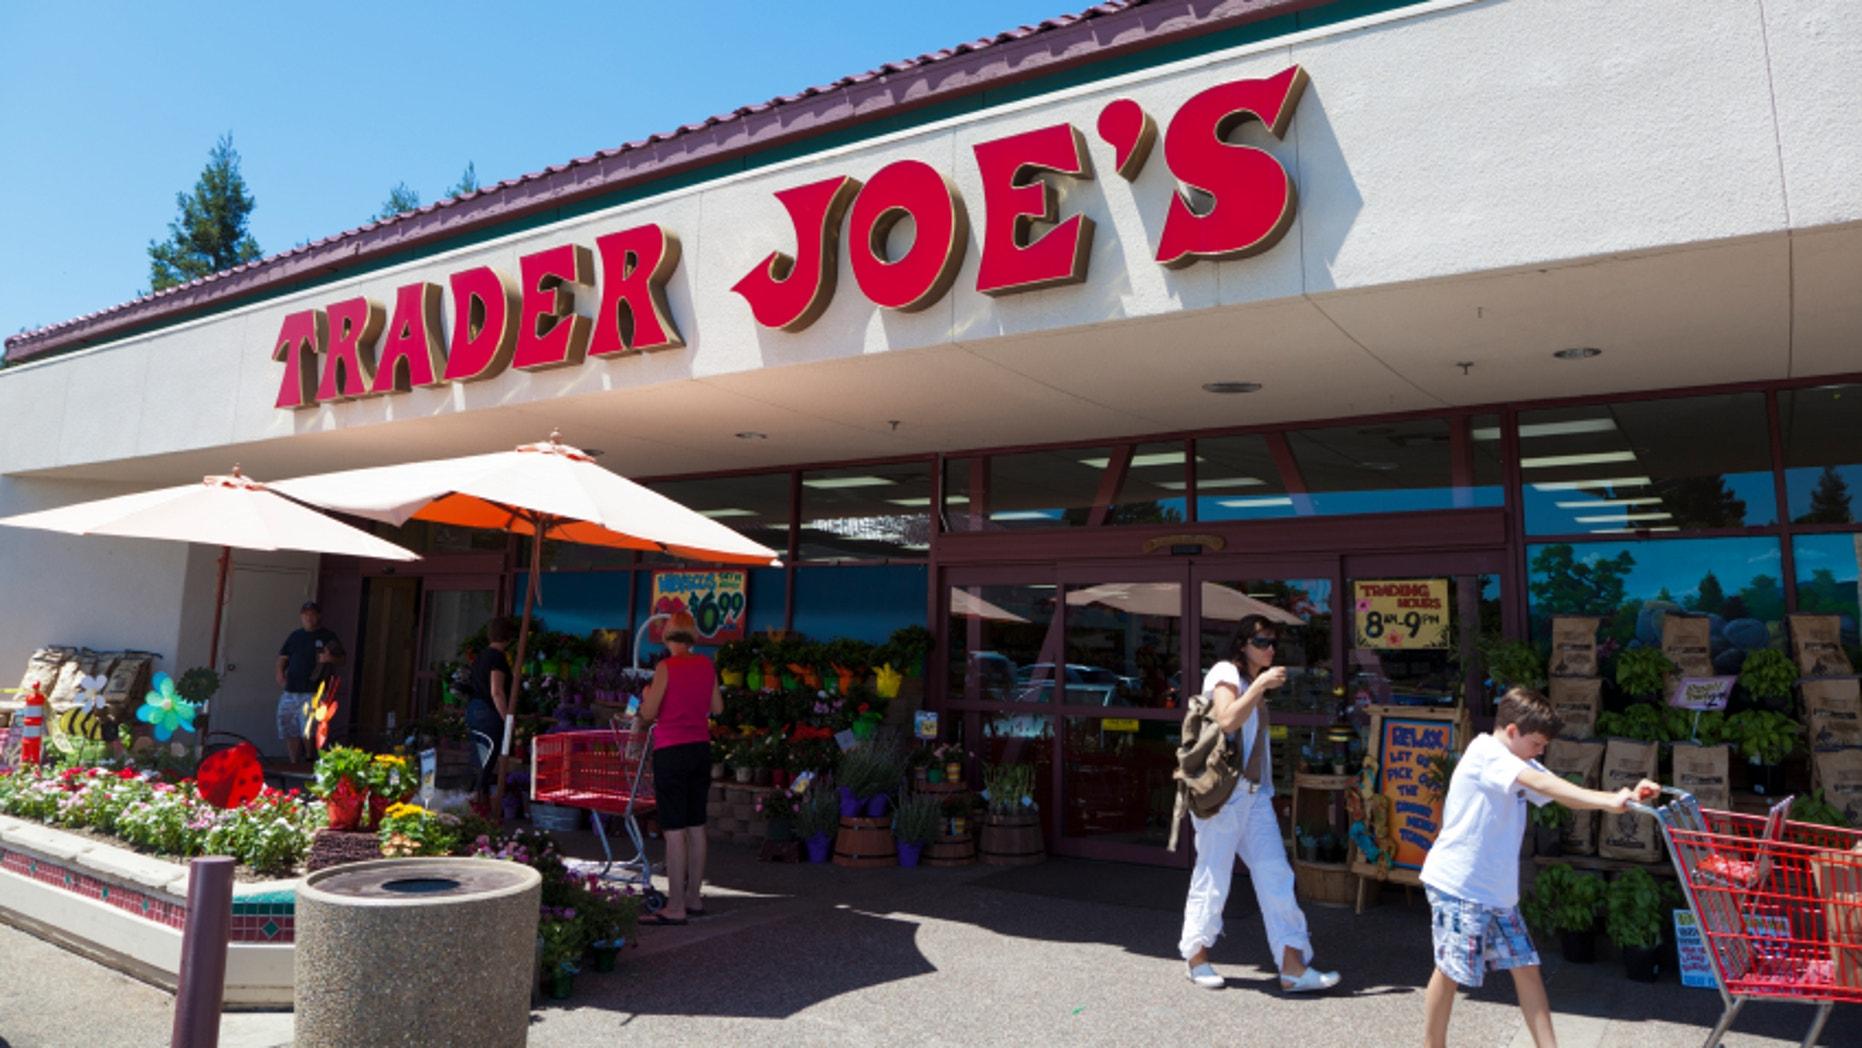 A Trader Joe's store in Fair Oaks, Calif.